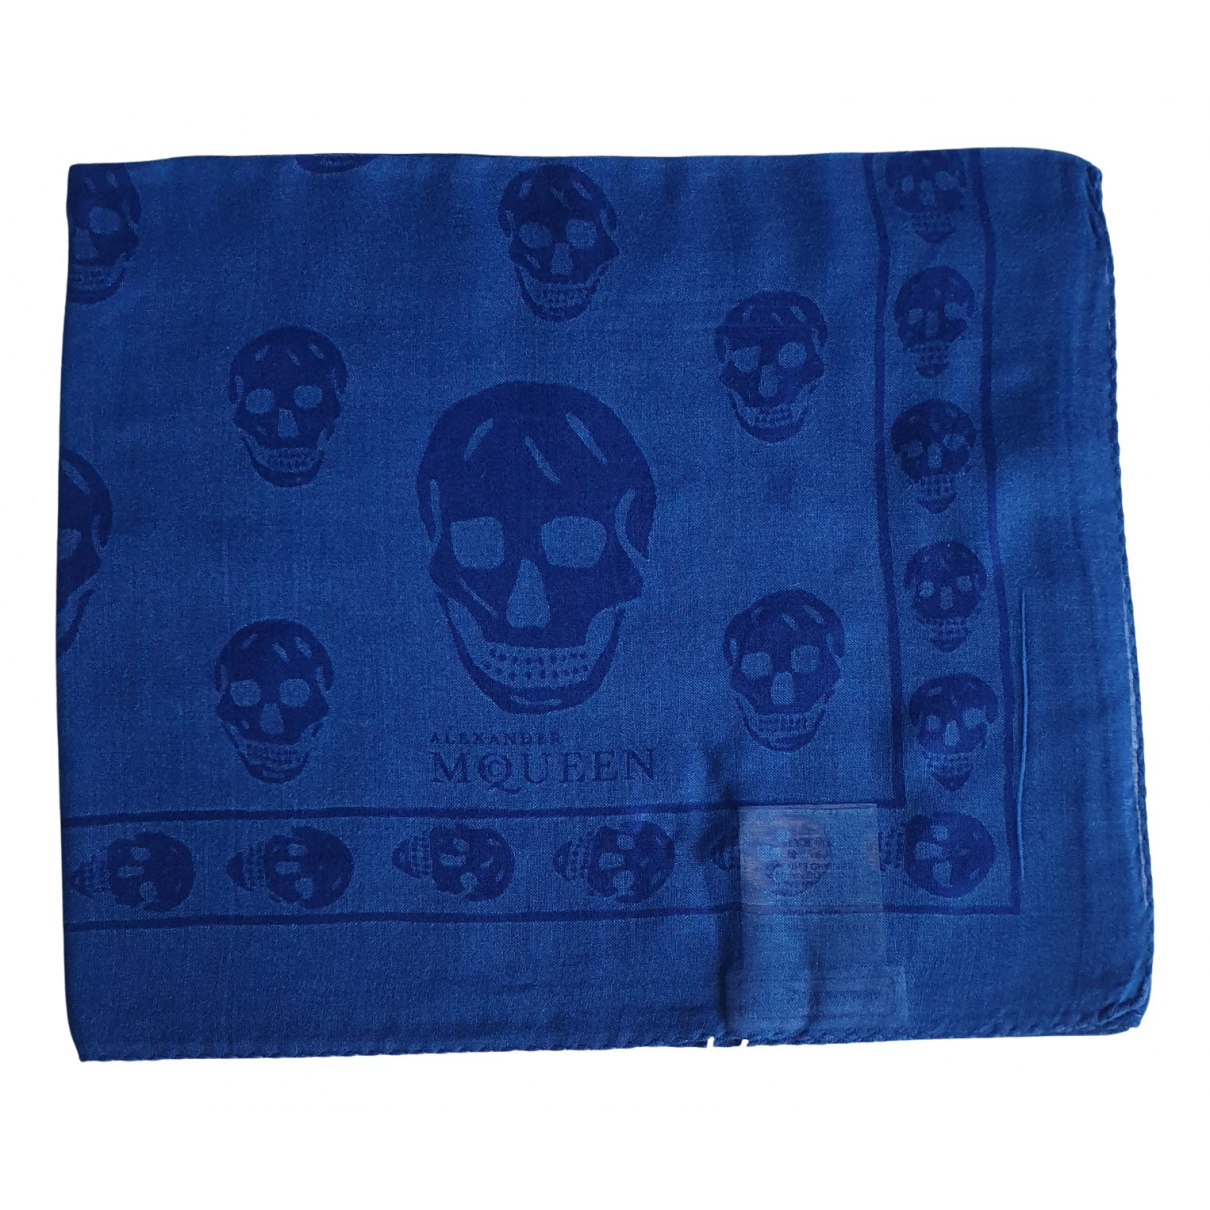 Alexander Mcqueen \N Blue scarf for Women \N